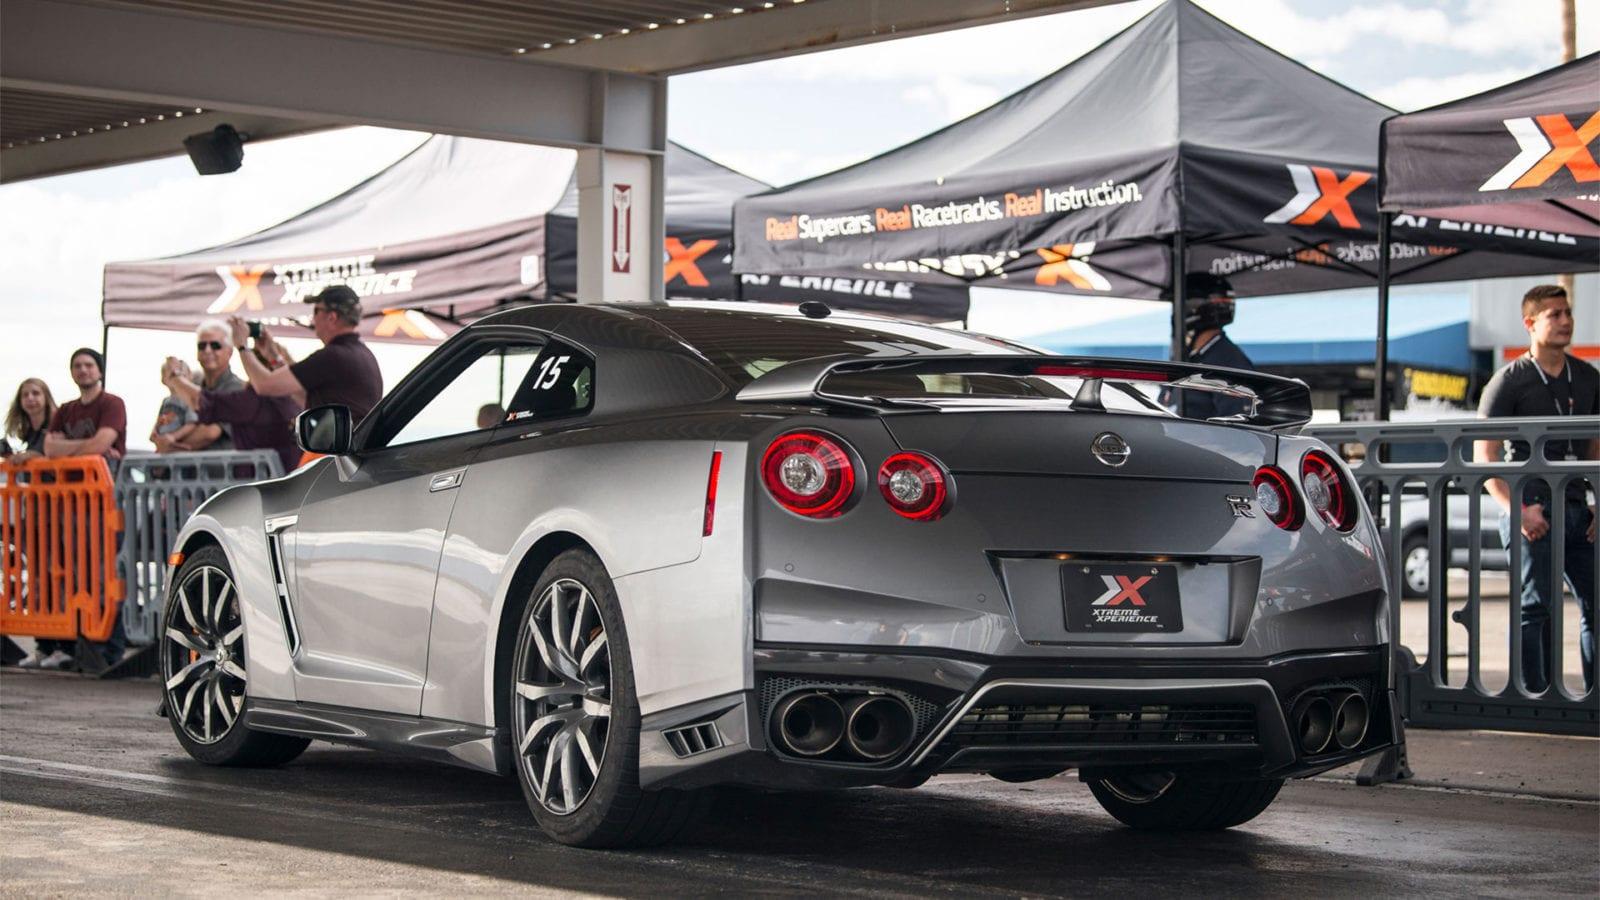 Nissan GT-R rear quarter panel